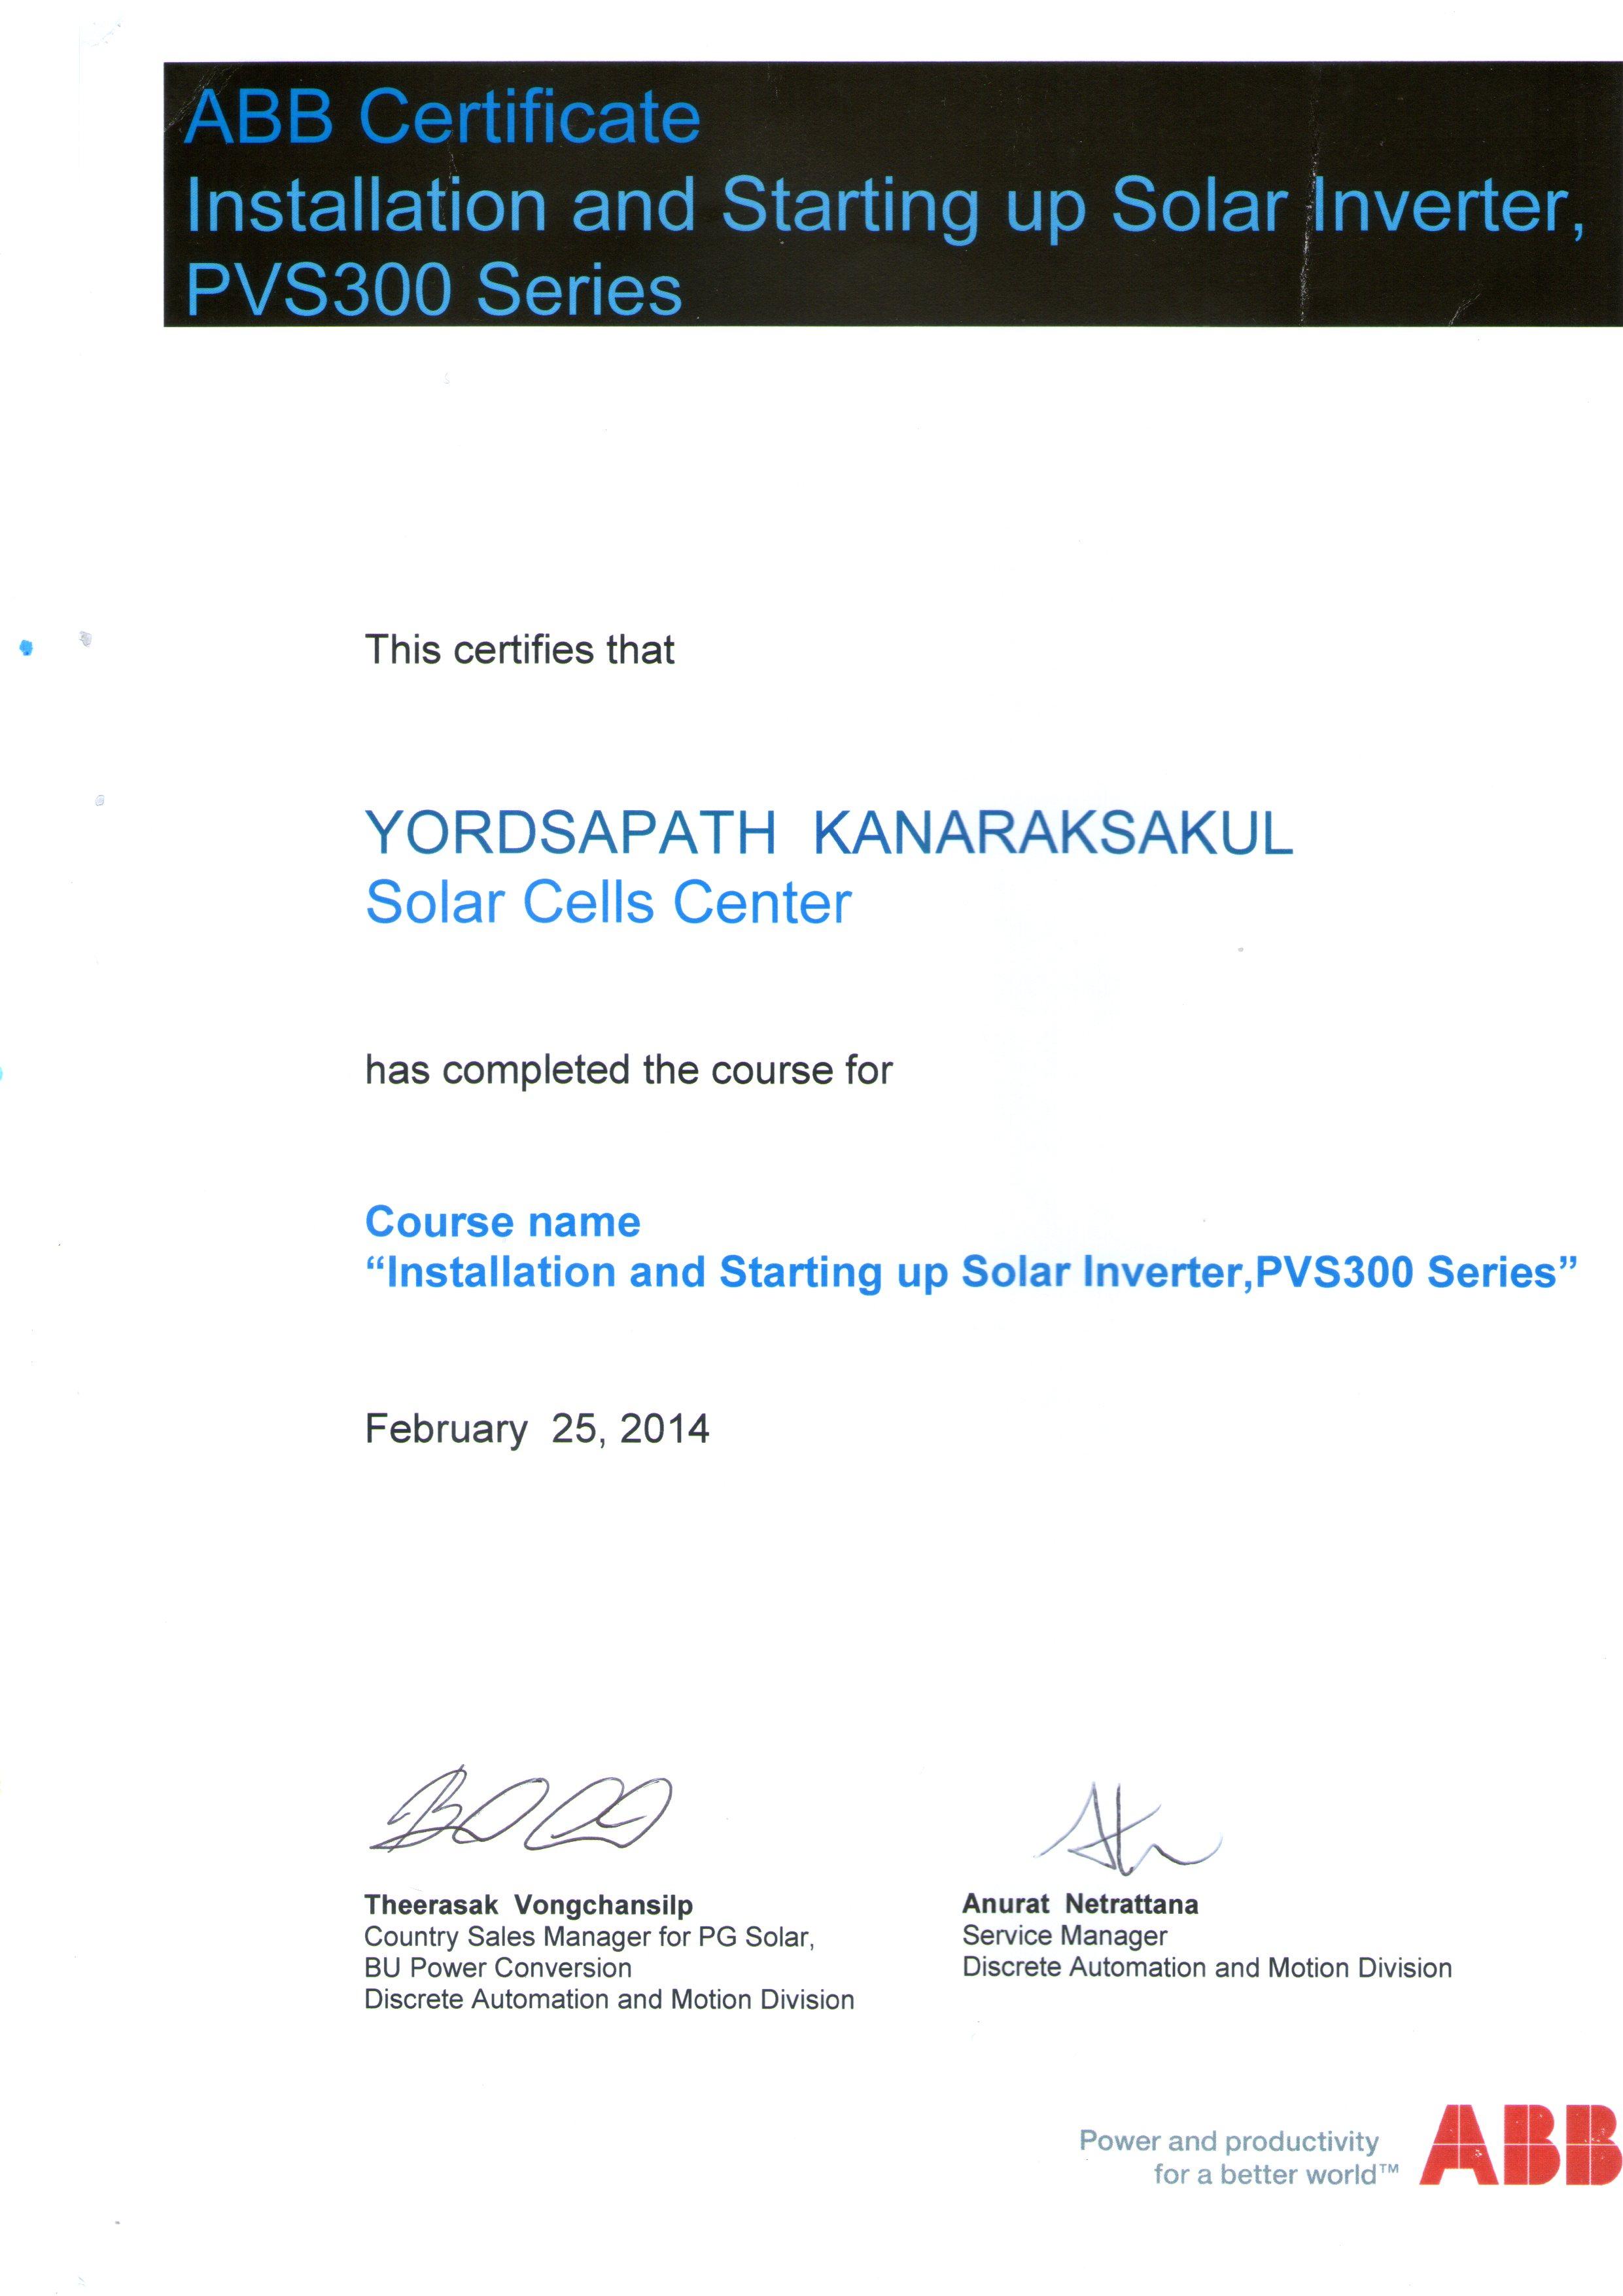 ABB Certification